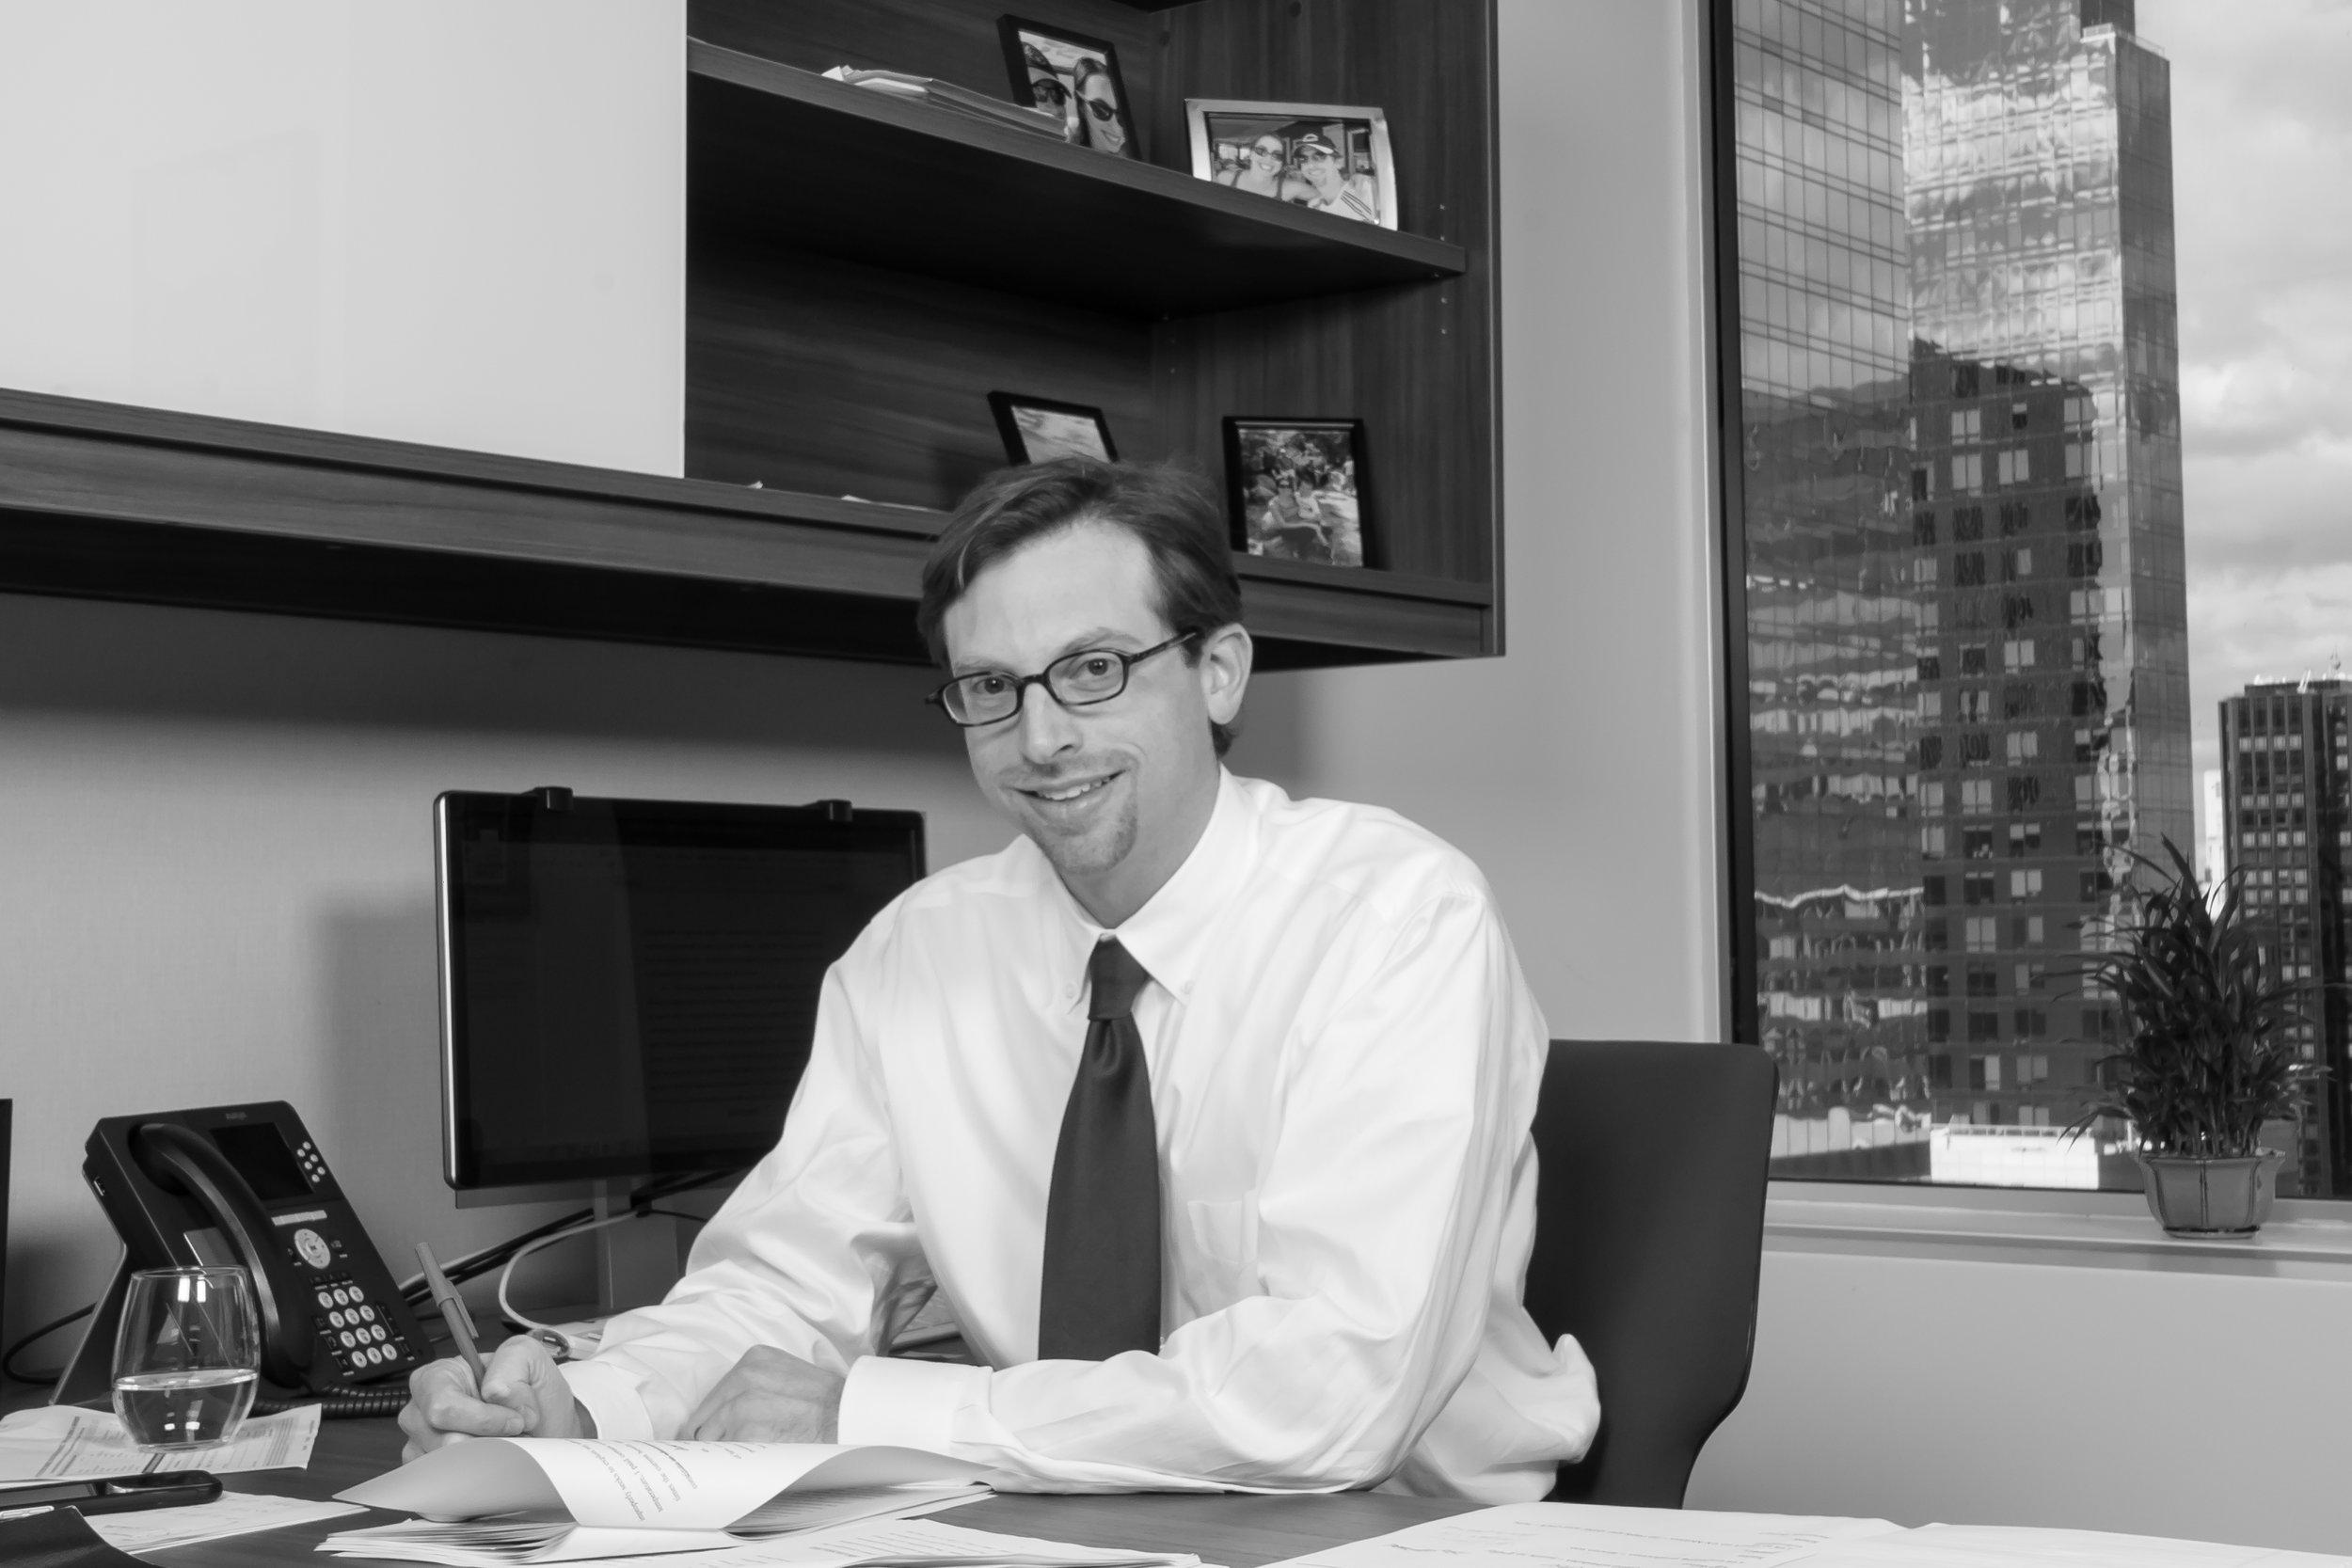 Alan R. Feigenbaum